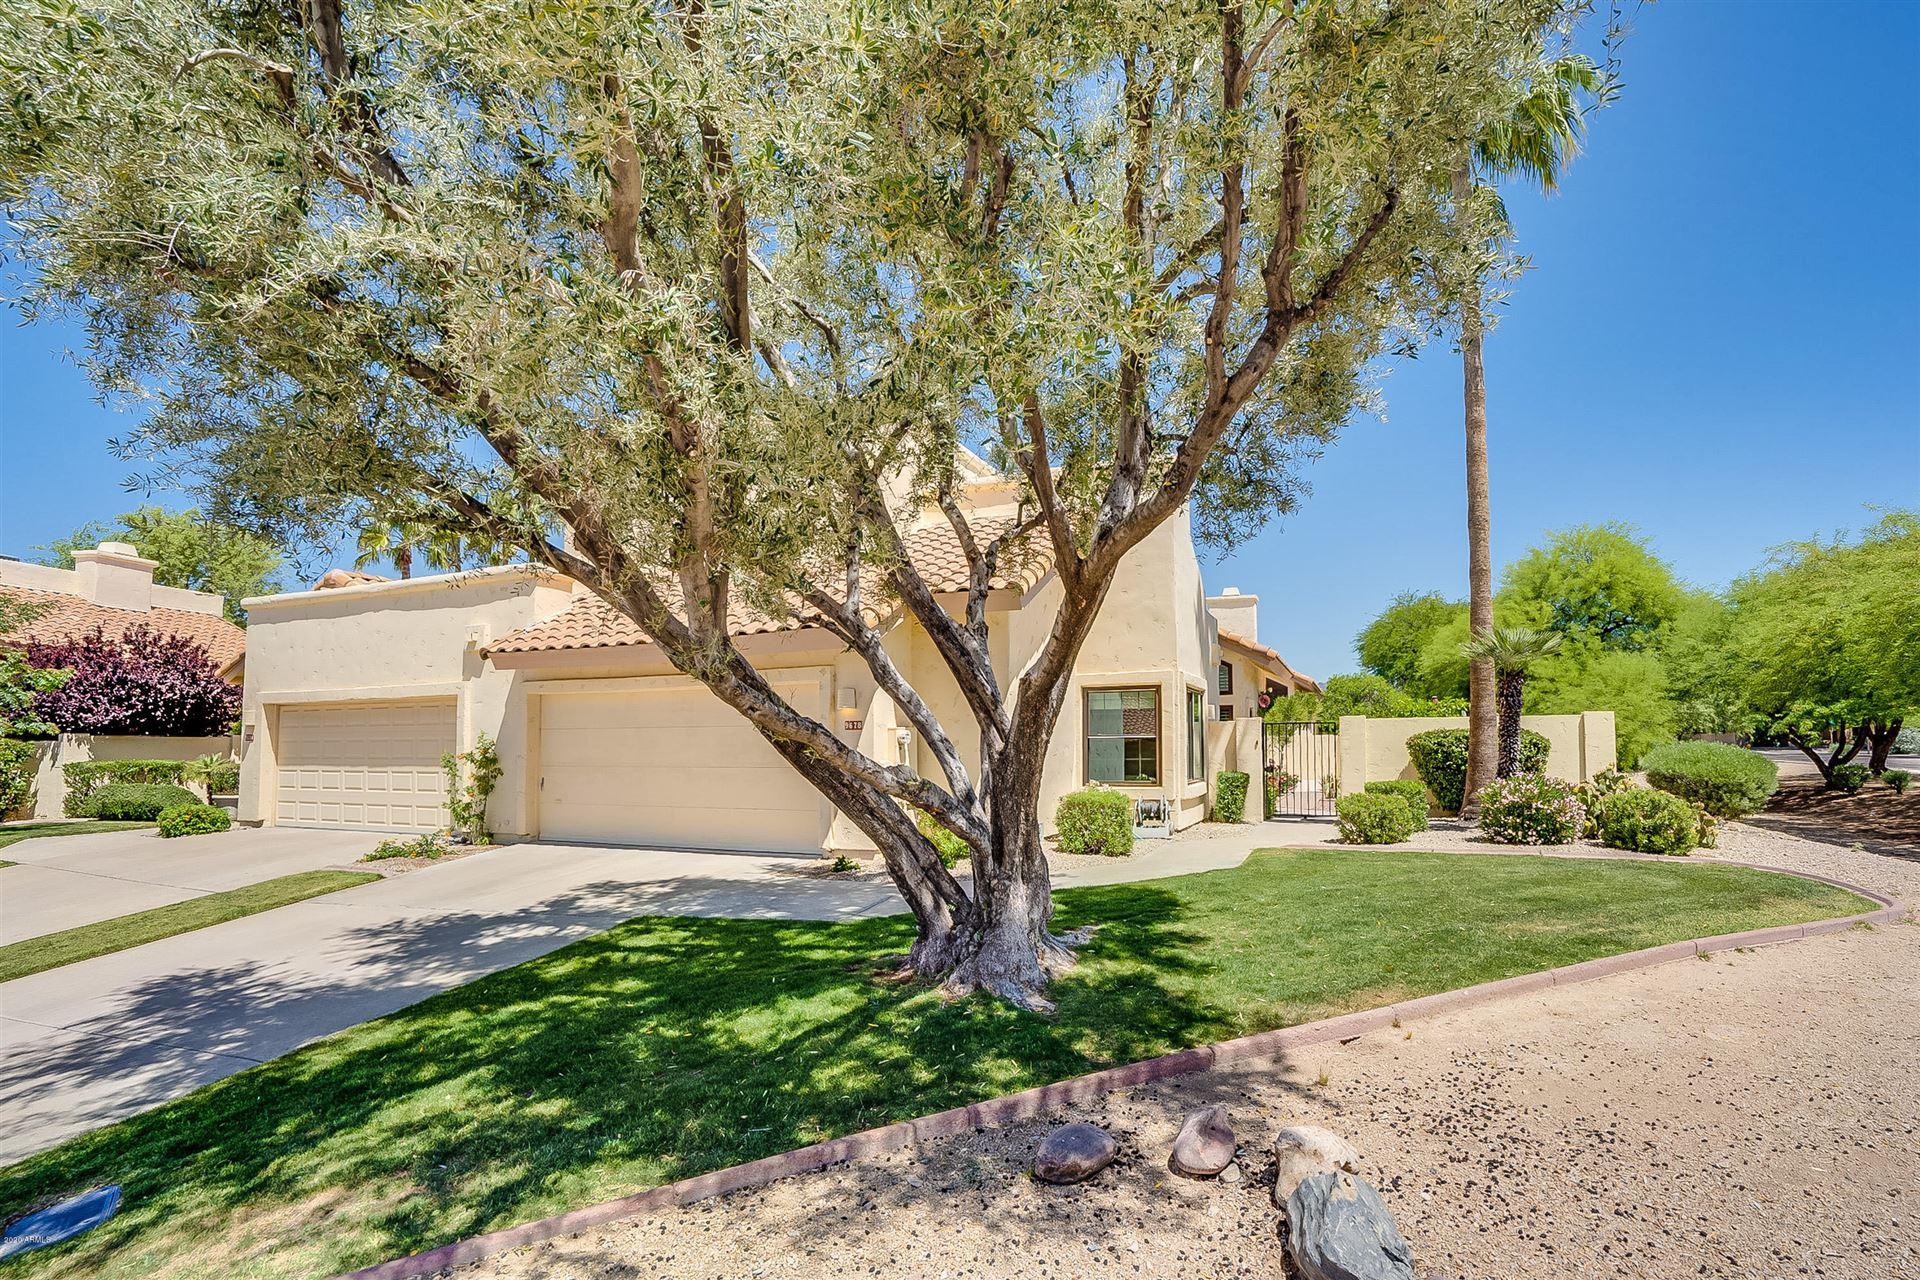 9678 E PERSHING Avenue, Scottsdale, AZ 85260 - #: 6086179